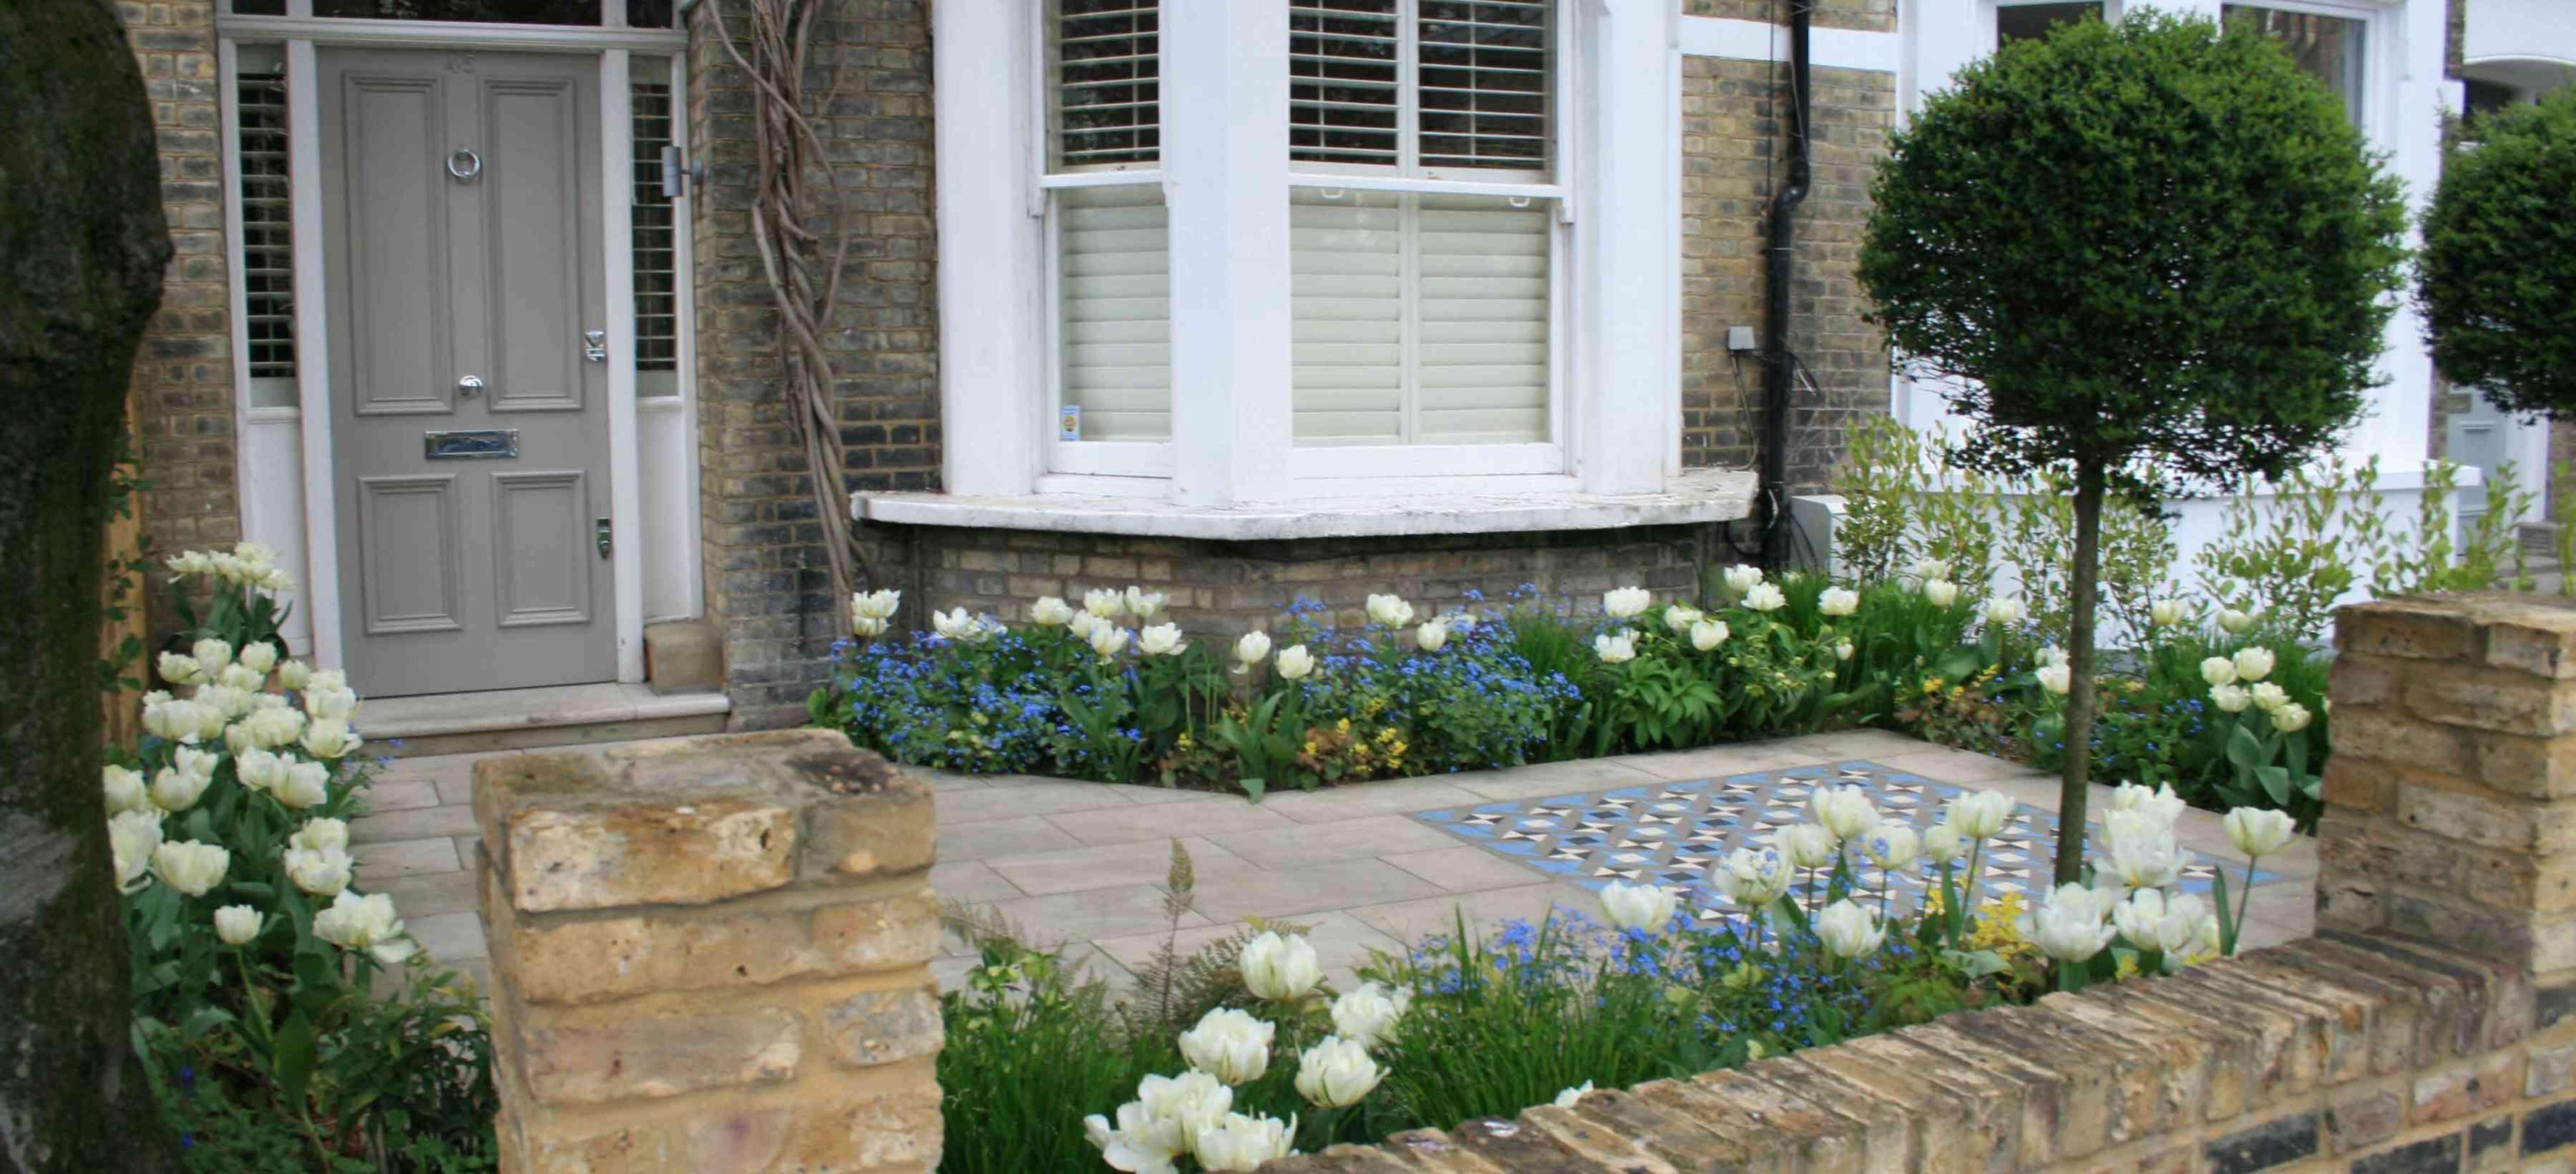 Neutral Grey Front Door With Sidelights Transom White Trim Tan Brick Walls Landscaping Front Garden Design Front Garden Townhouse Garden